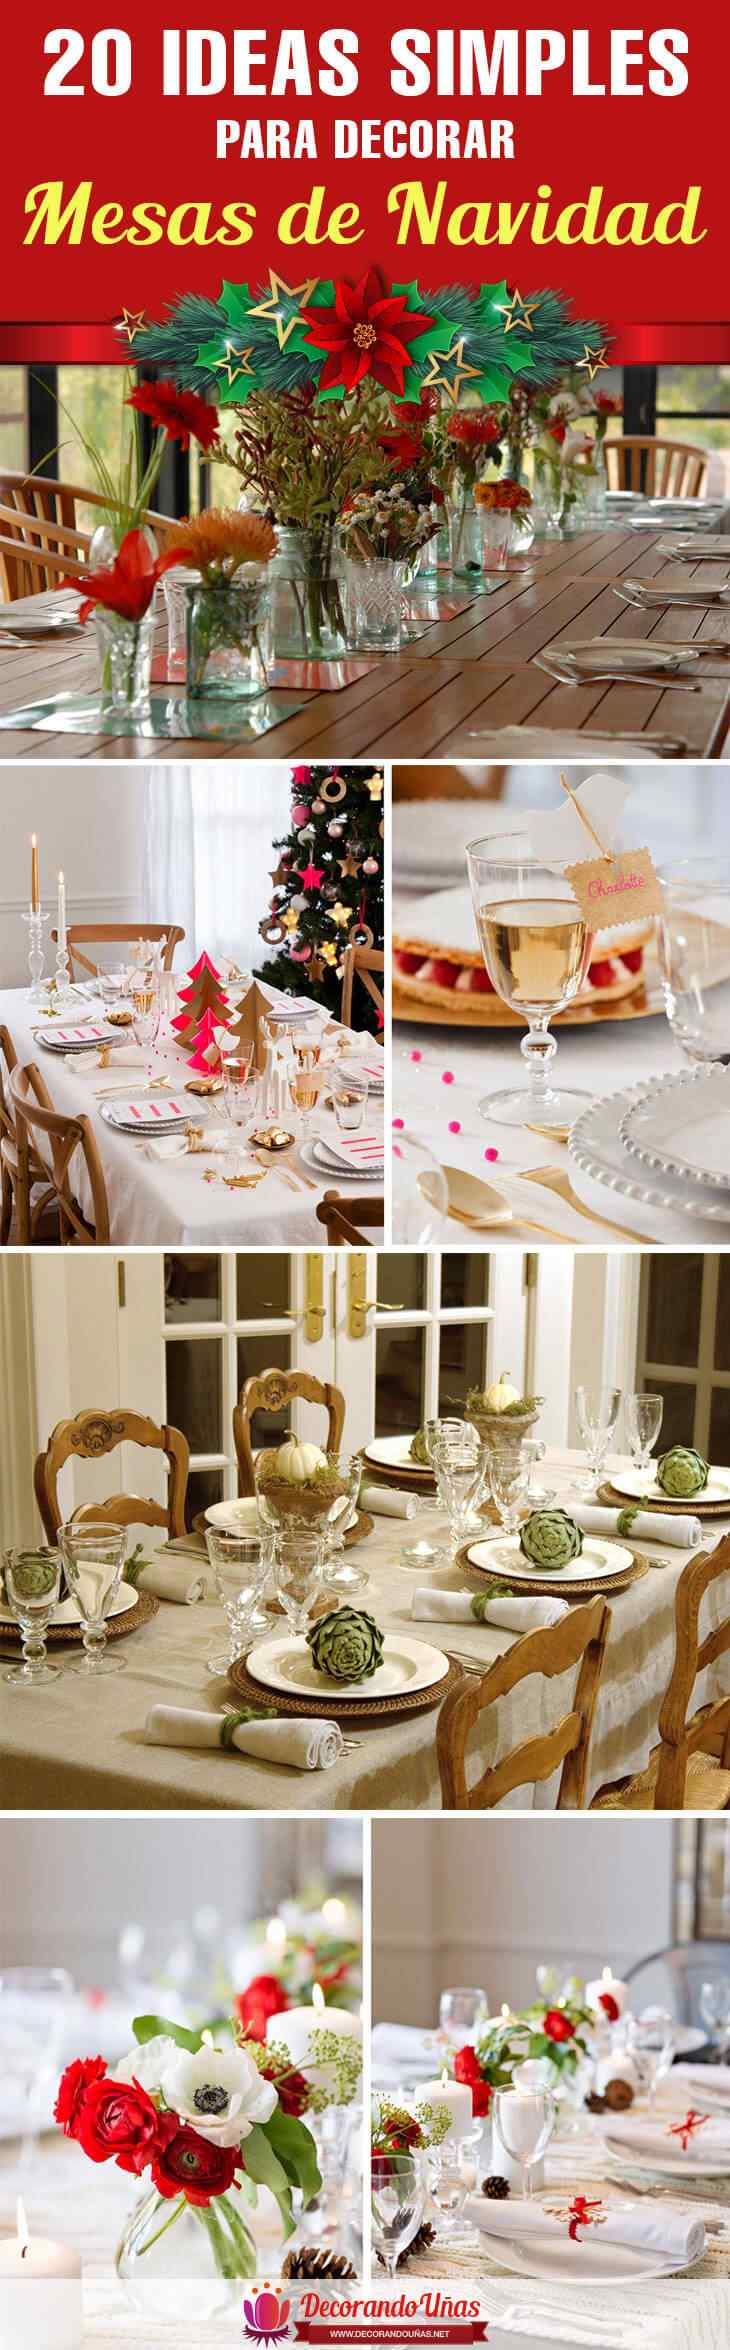 decorar-mesas-navidad-pinterest